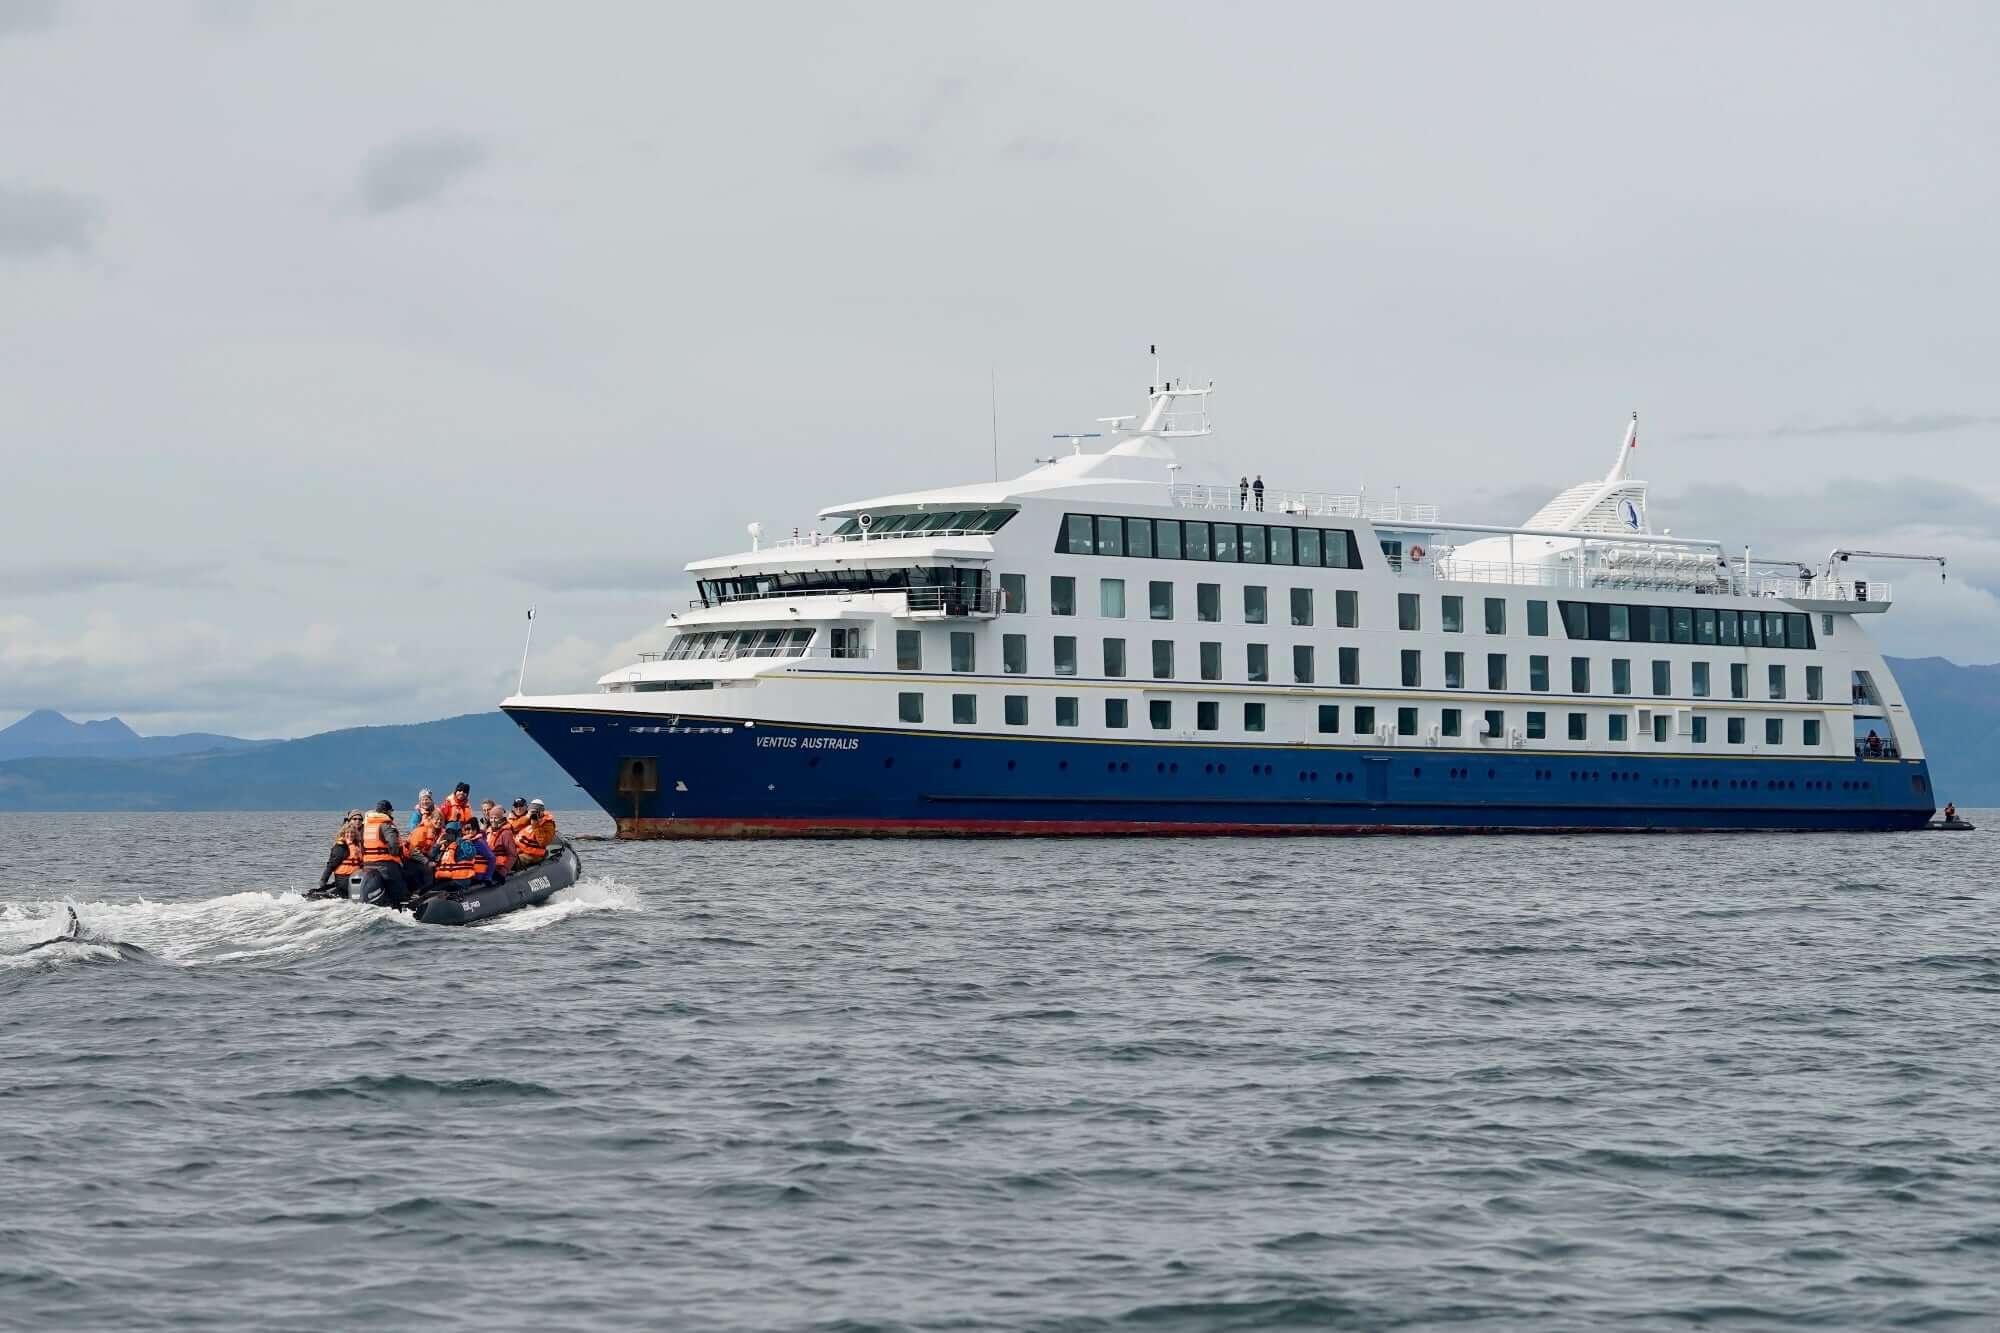 Australis Cruise around Cape Horn, Chile